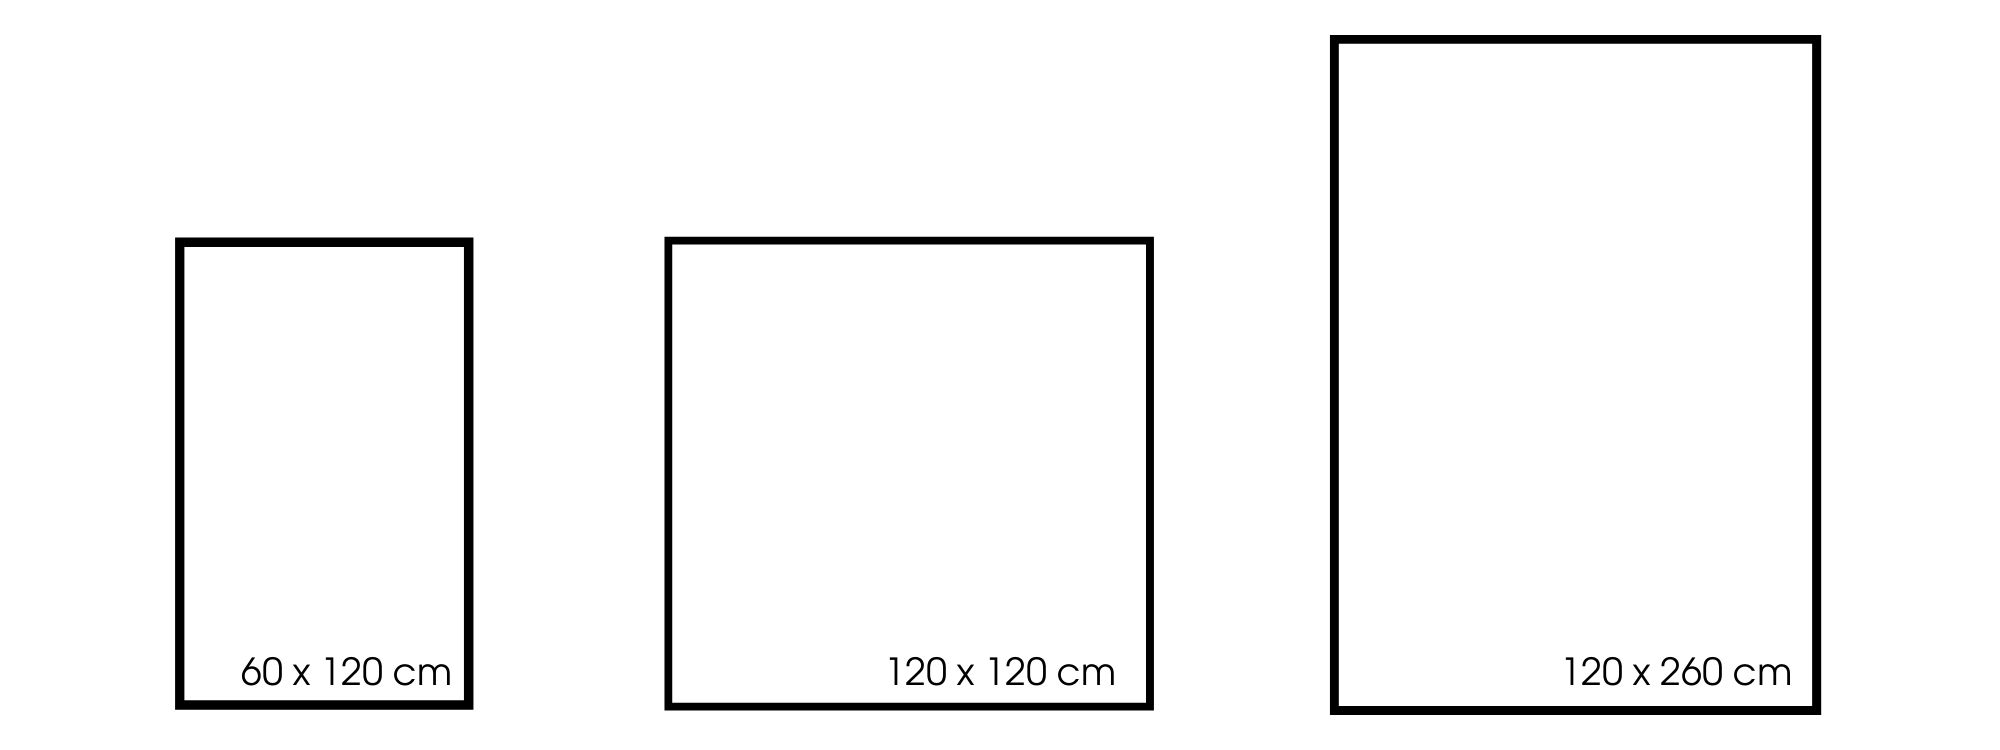 Größe Calcestrozzo